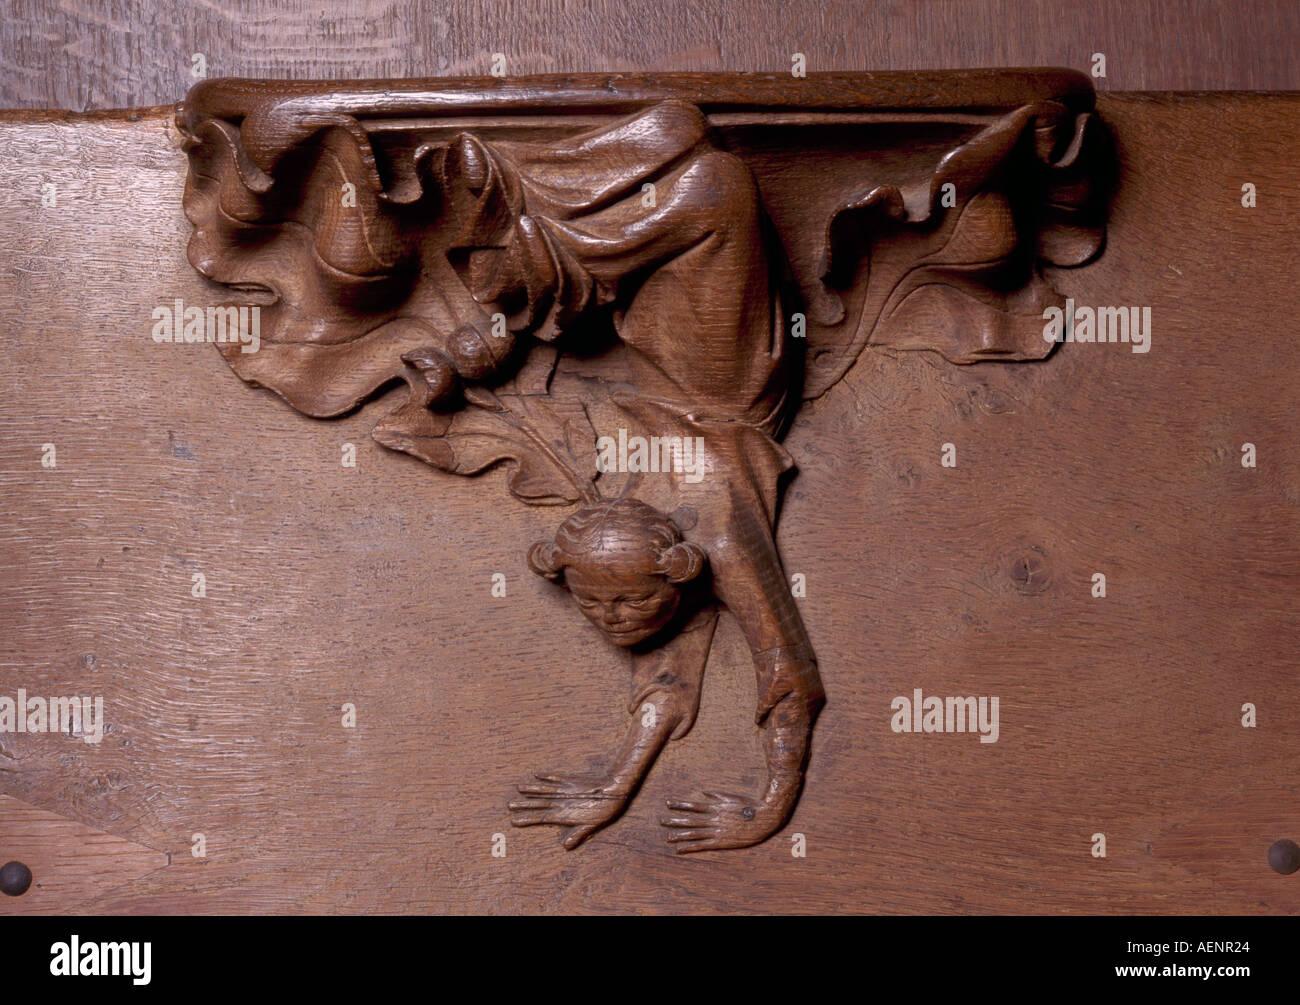 Köln, Dom, Detail des Chorgestühls, Frau im Handstand - Stock Image